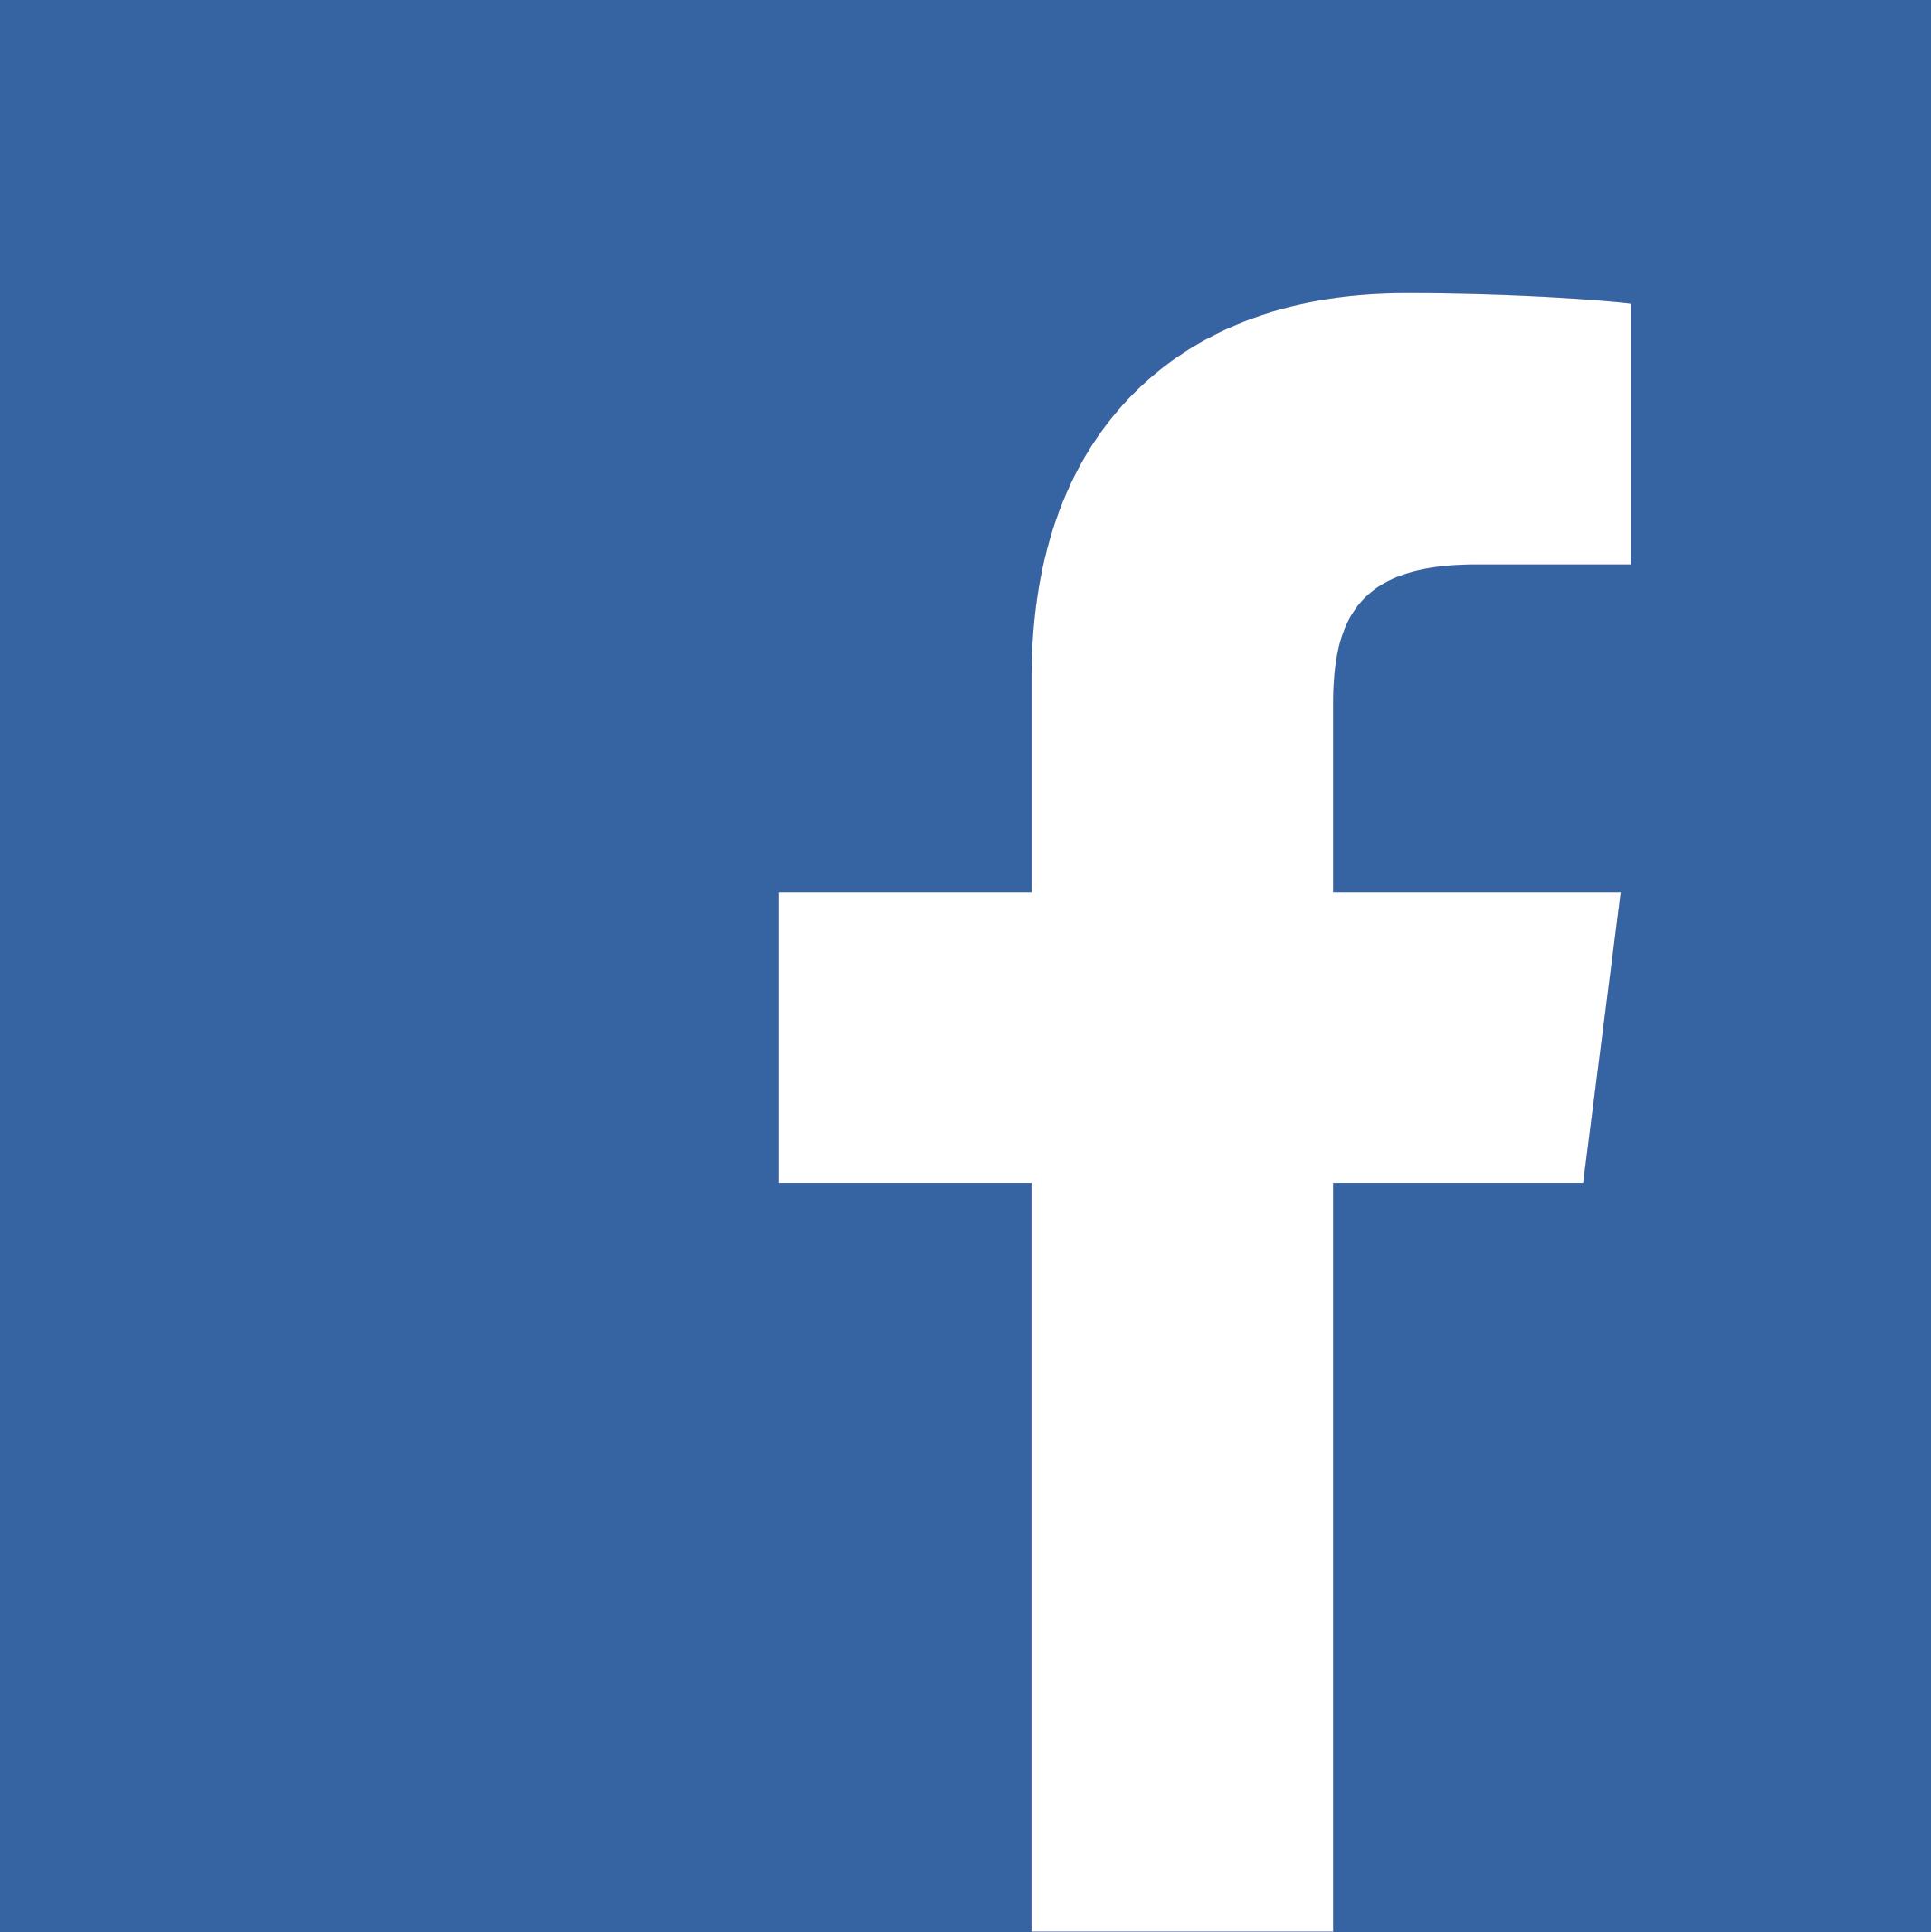 FB-fLogo-Blue-printpackaging